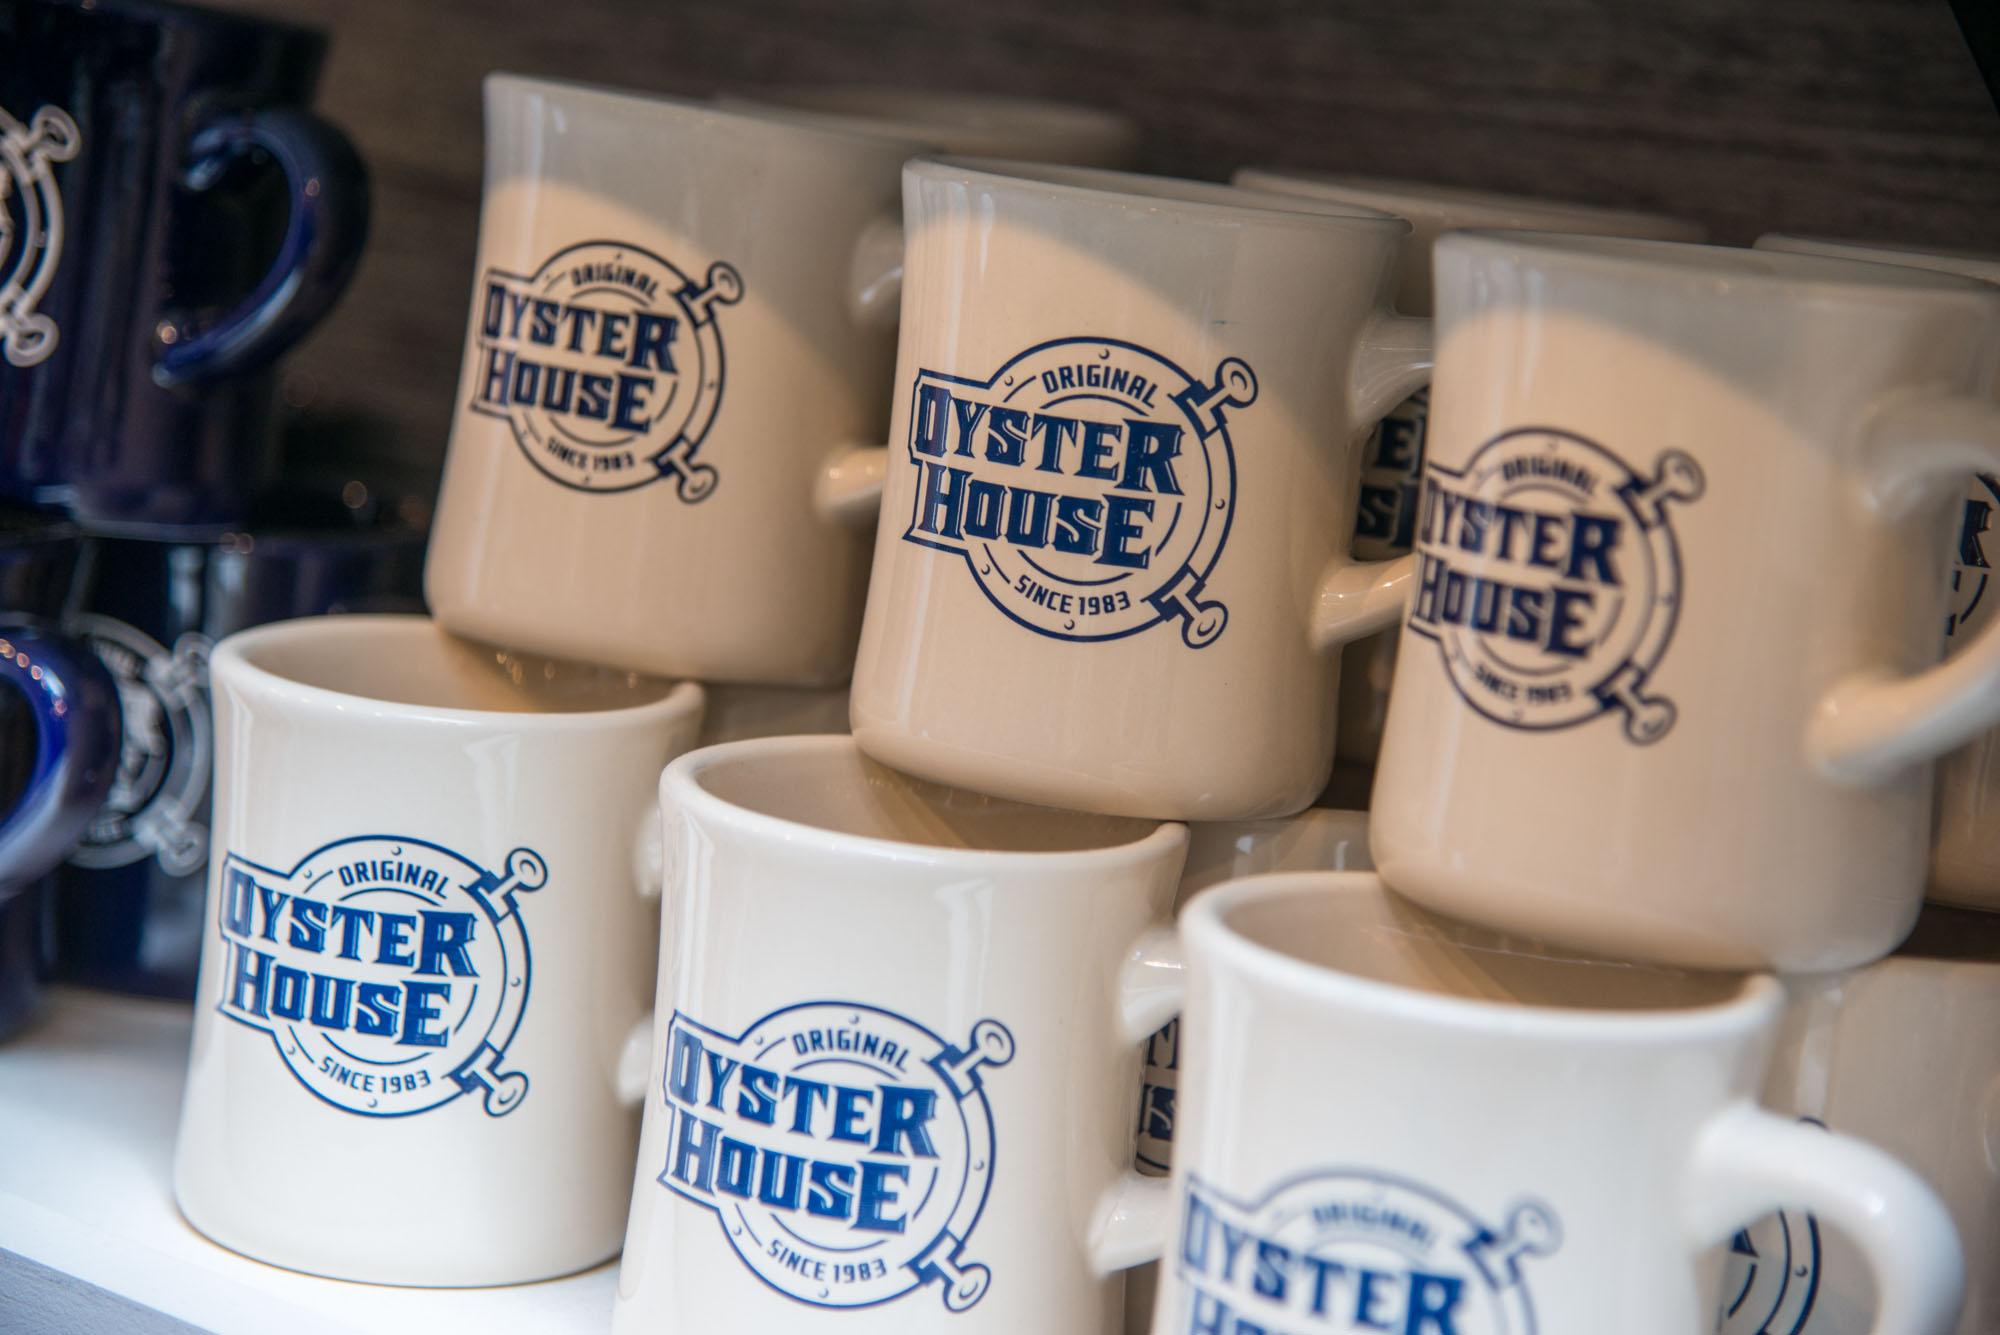 original oyster house mugs